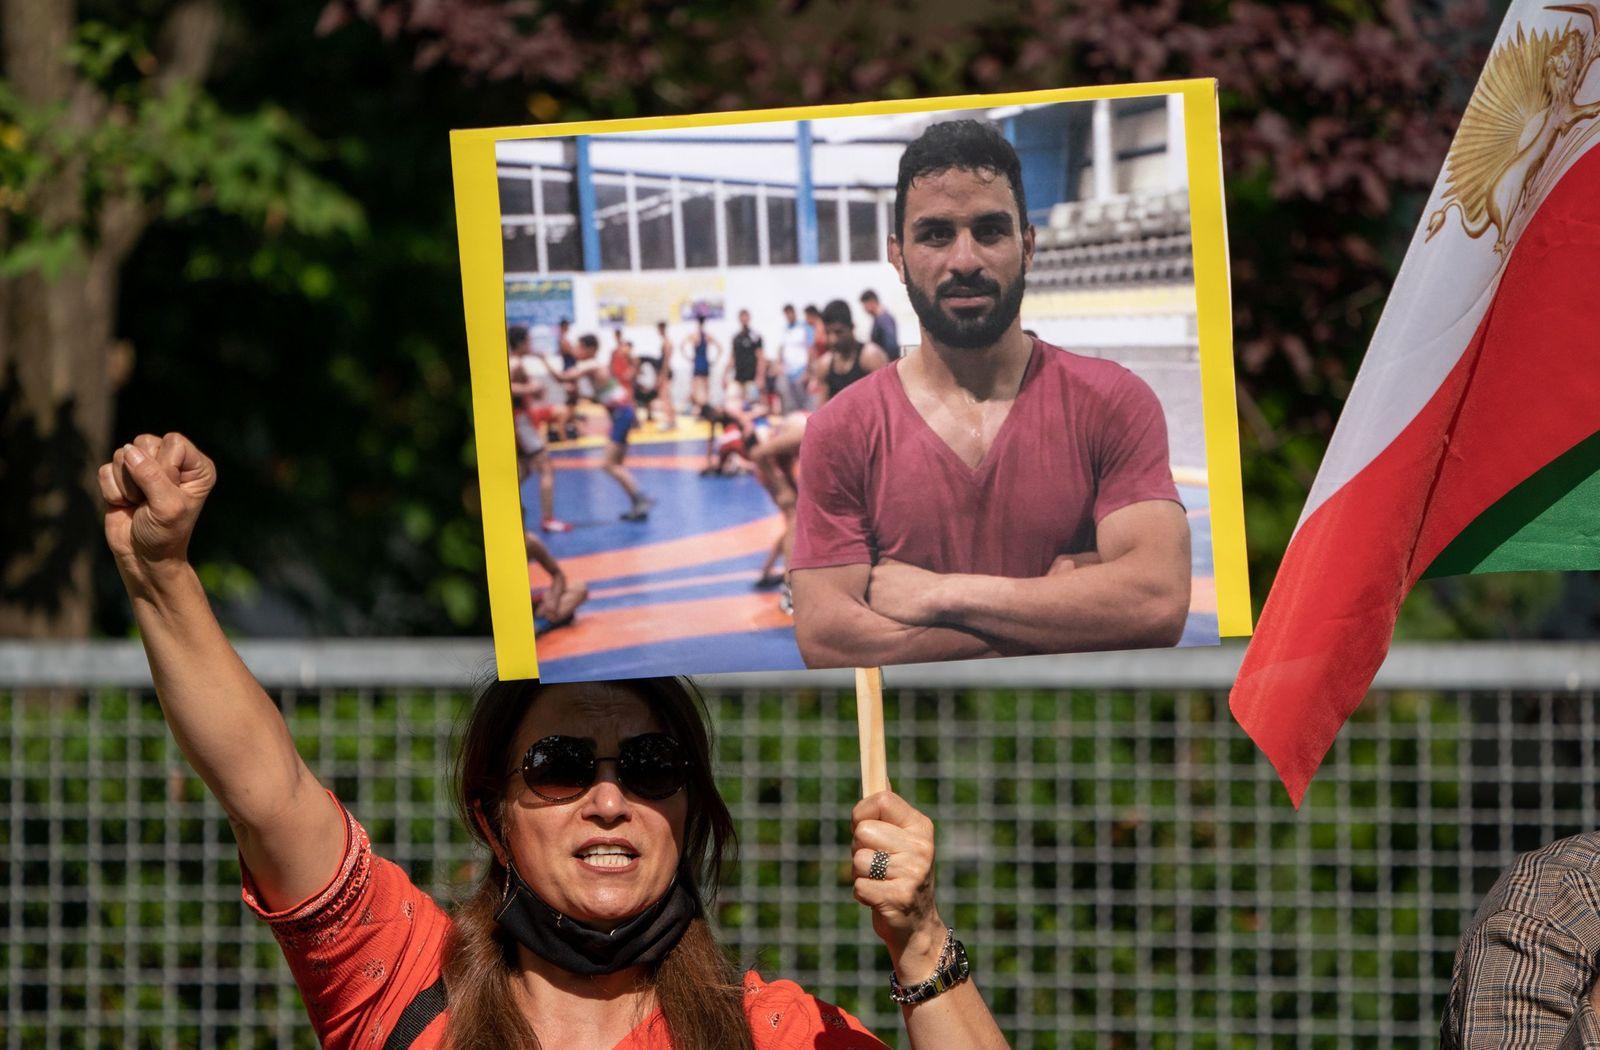 Protest in Berlin against execution of Iranian wrestler Navid Afkari, Deu - 12 Sep 2020